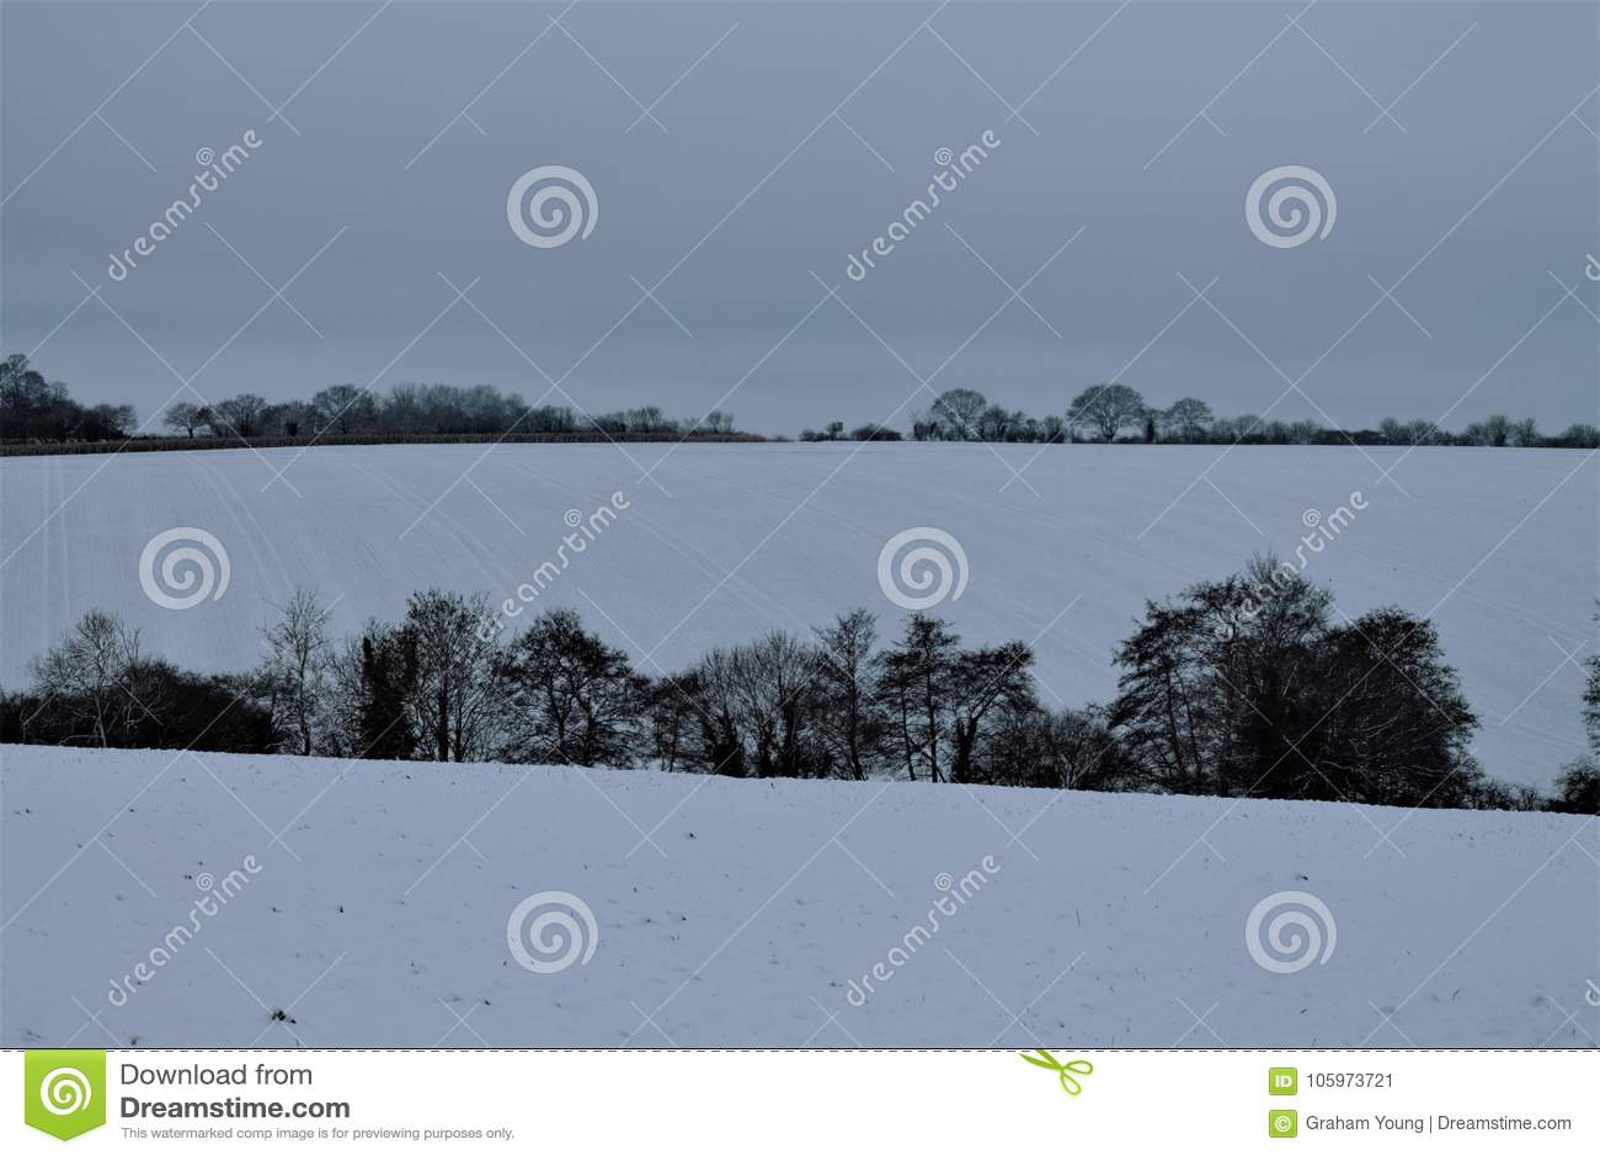 Suffolk snw in Shimpling